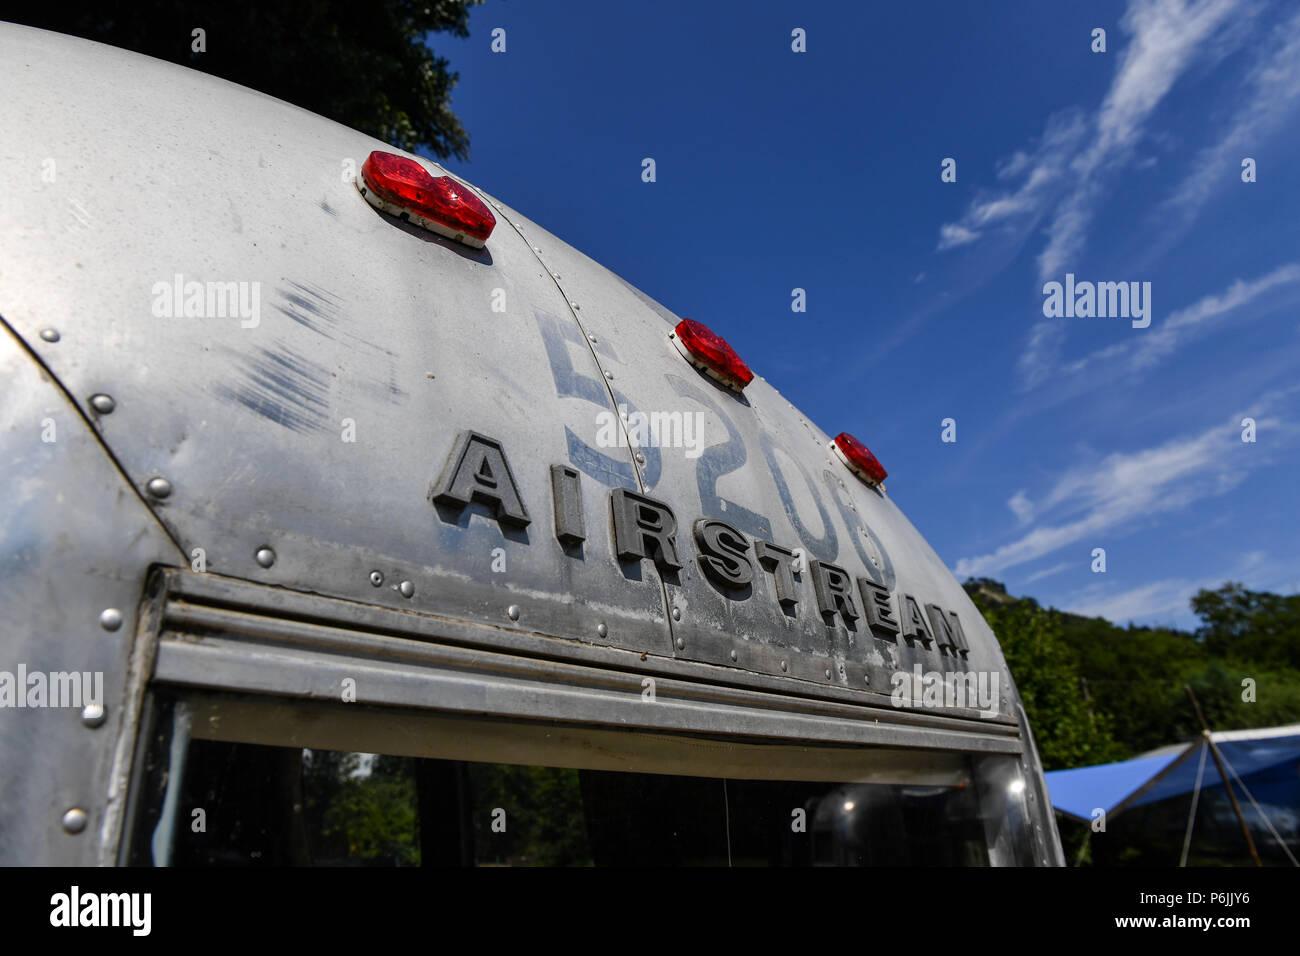 Airstream Trailers Stock Photos & Airstream Trailers Stock